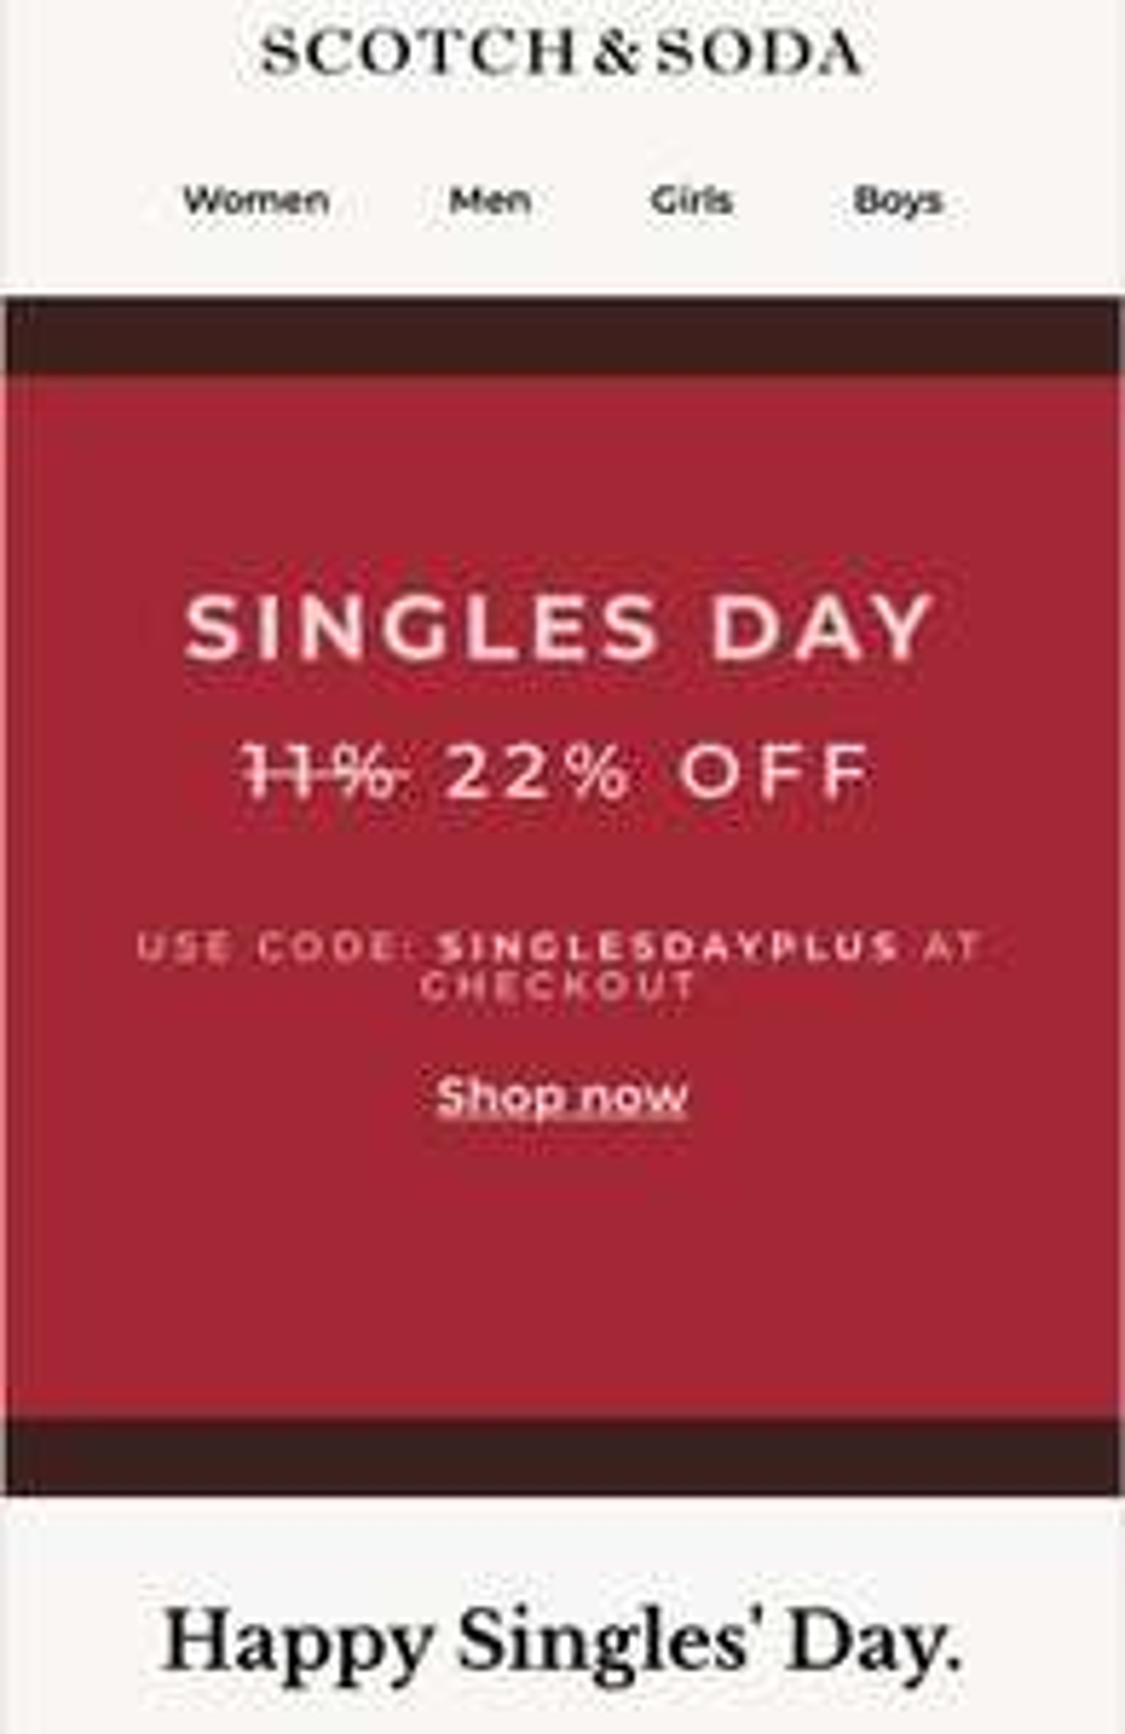 Singles day by Scotch & Soda, 22% korting